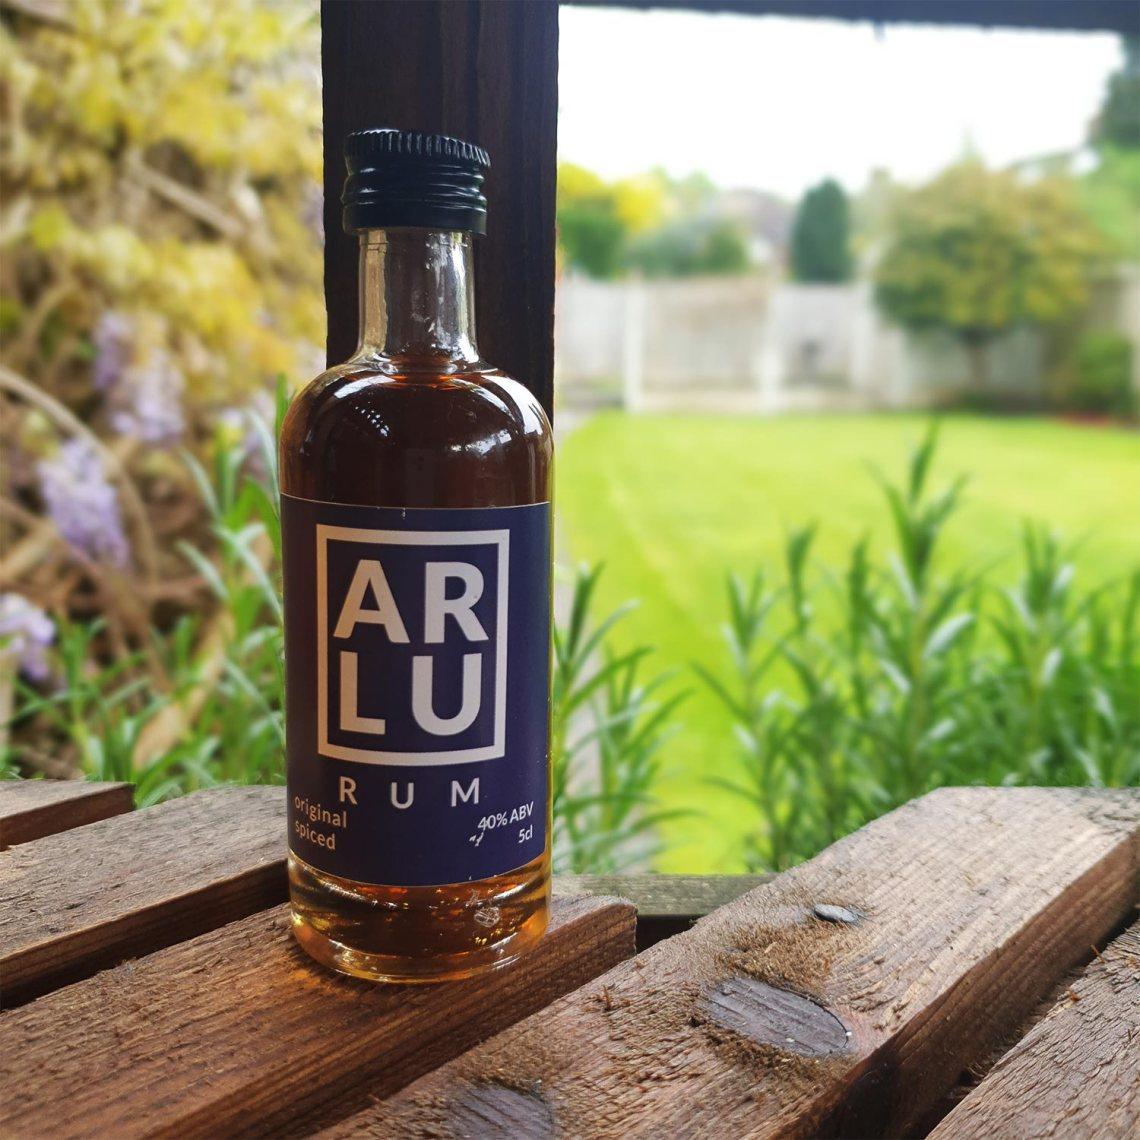 ARLU Rum Original Spiced - Female Original